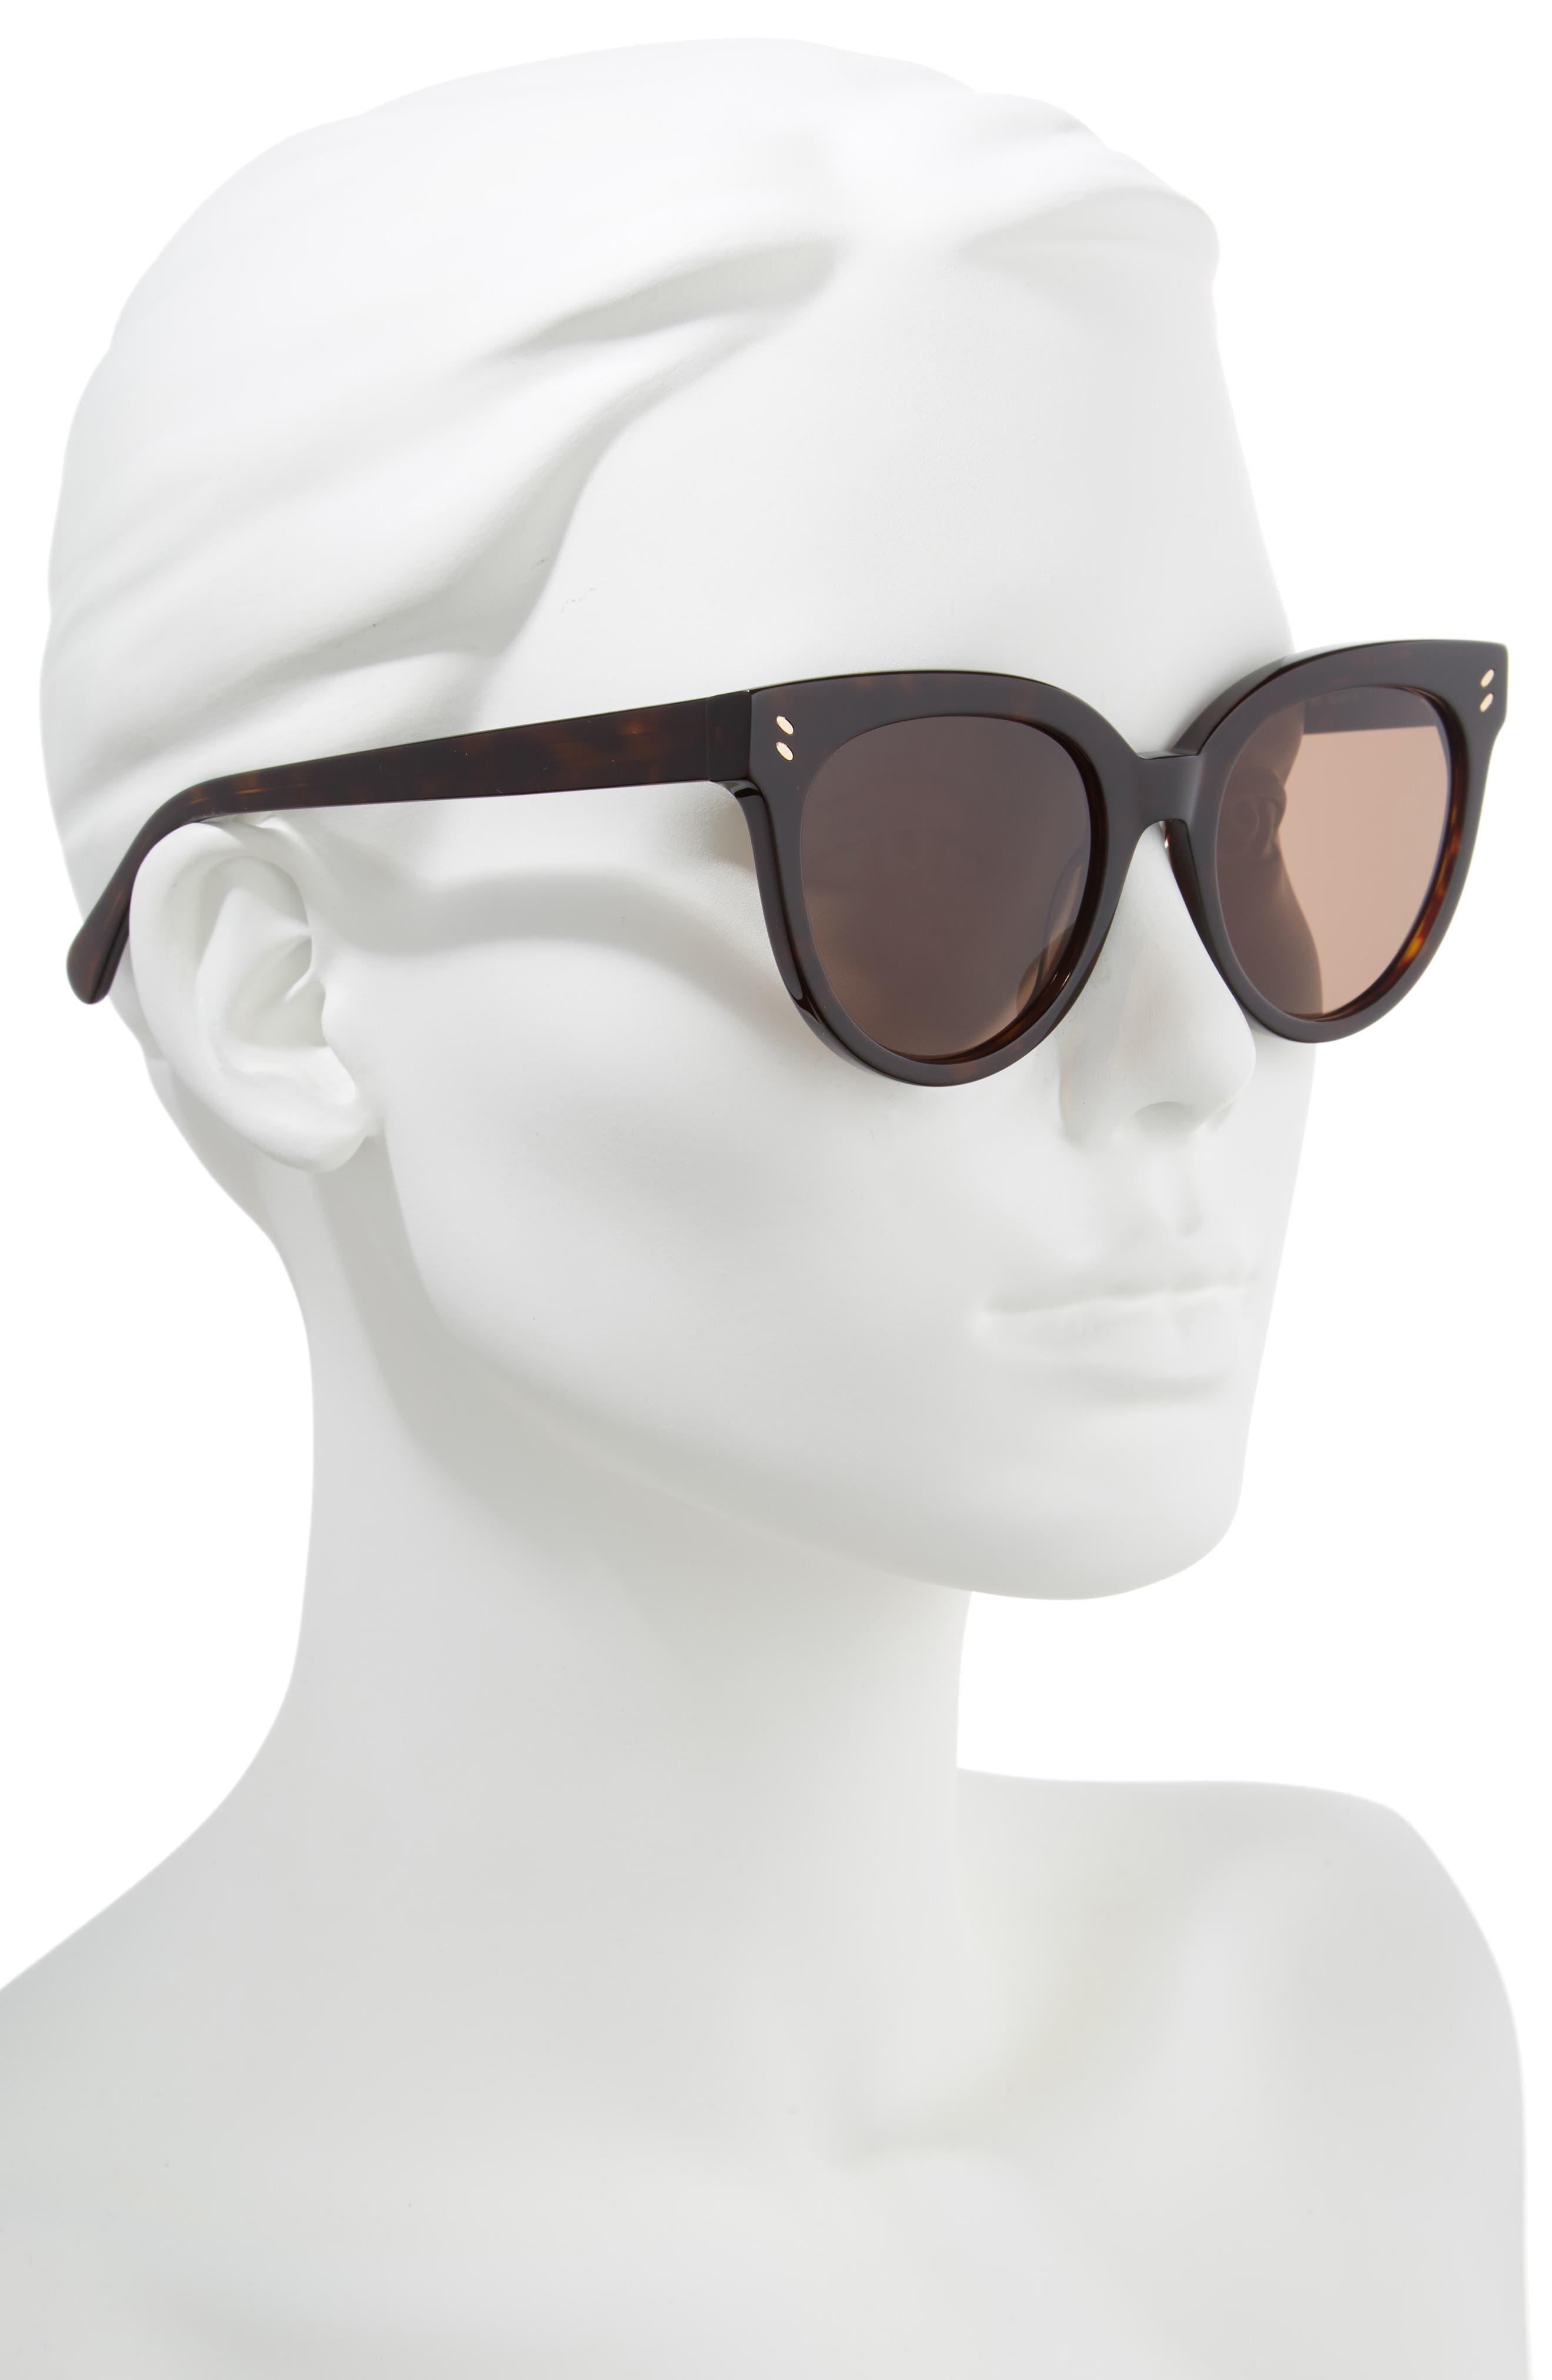 52mm Sunglasses,                             Alternate thumbnail 2, color,                             Shiny Dark Havana